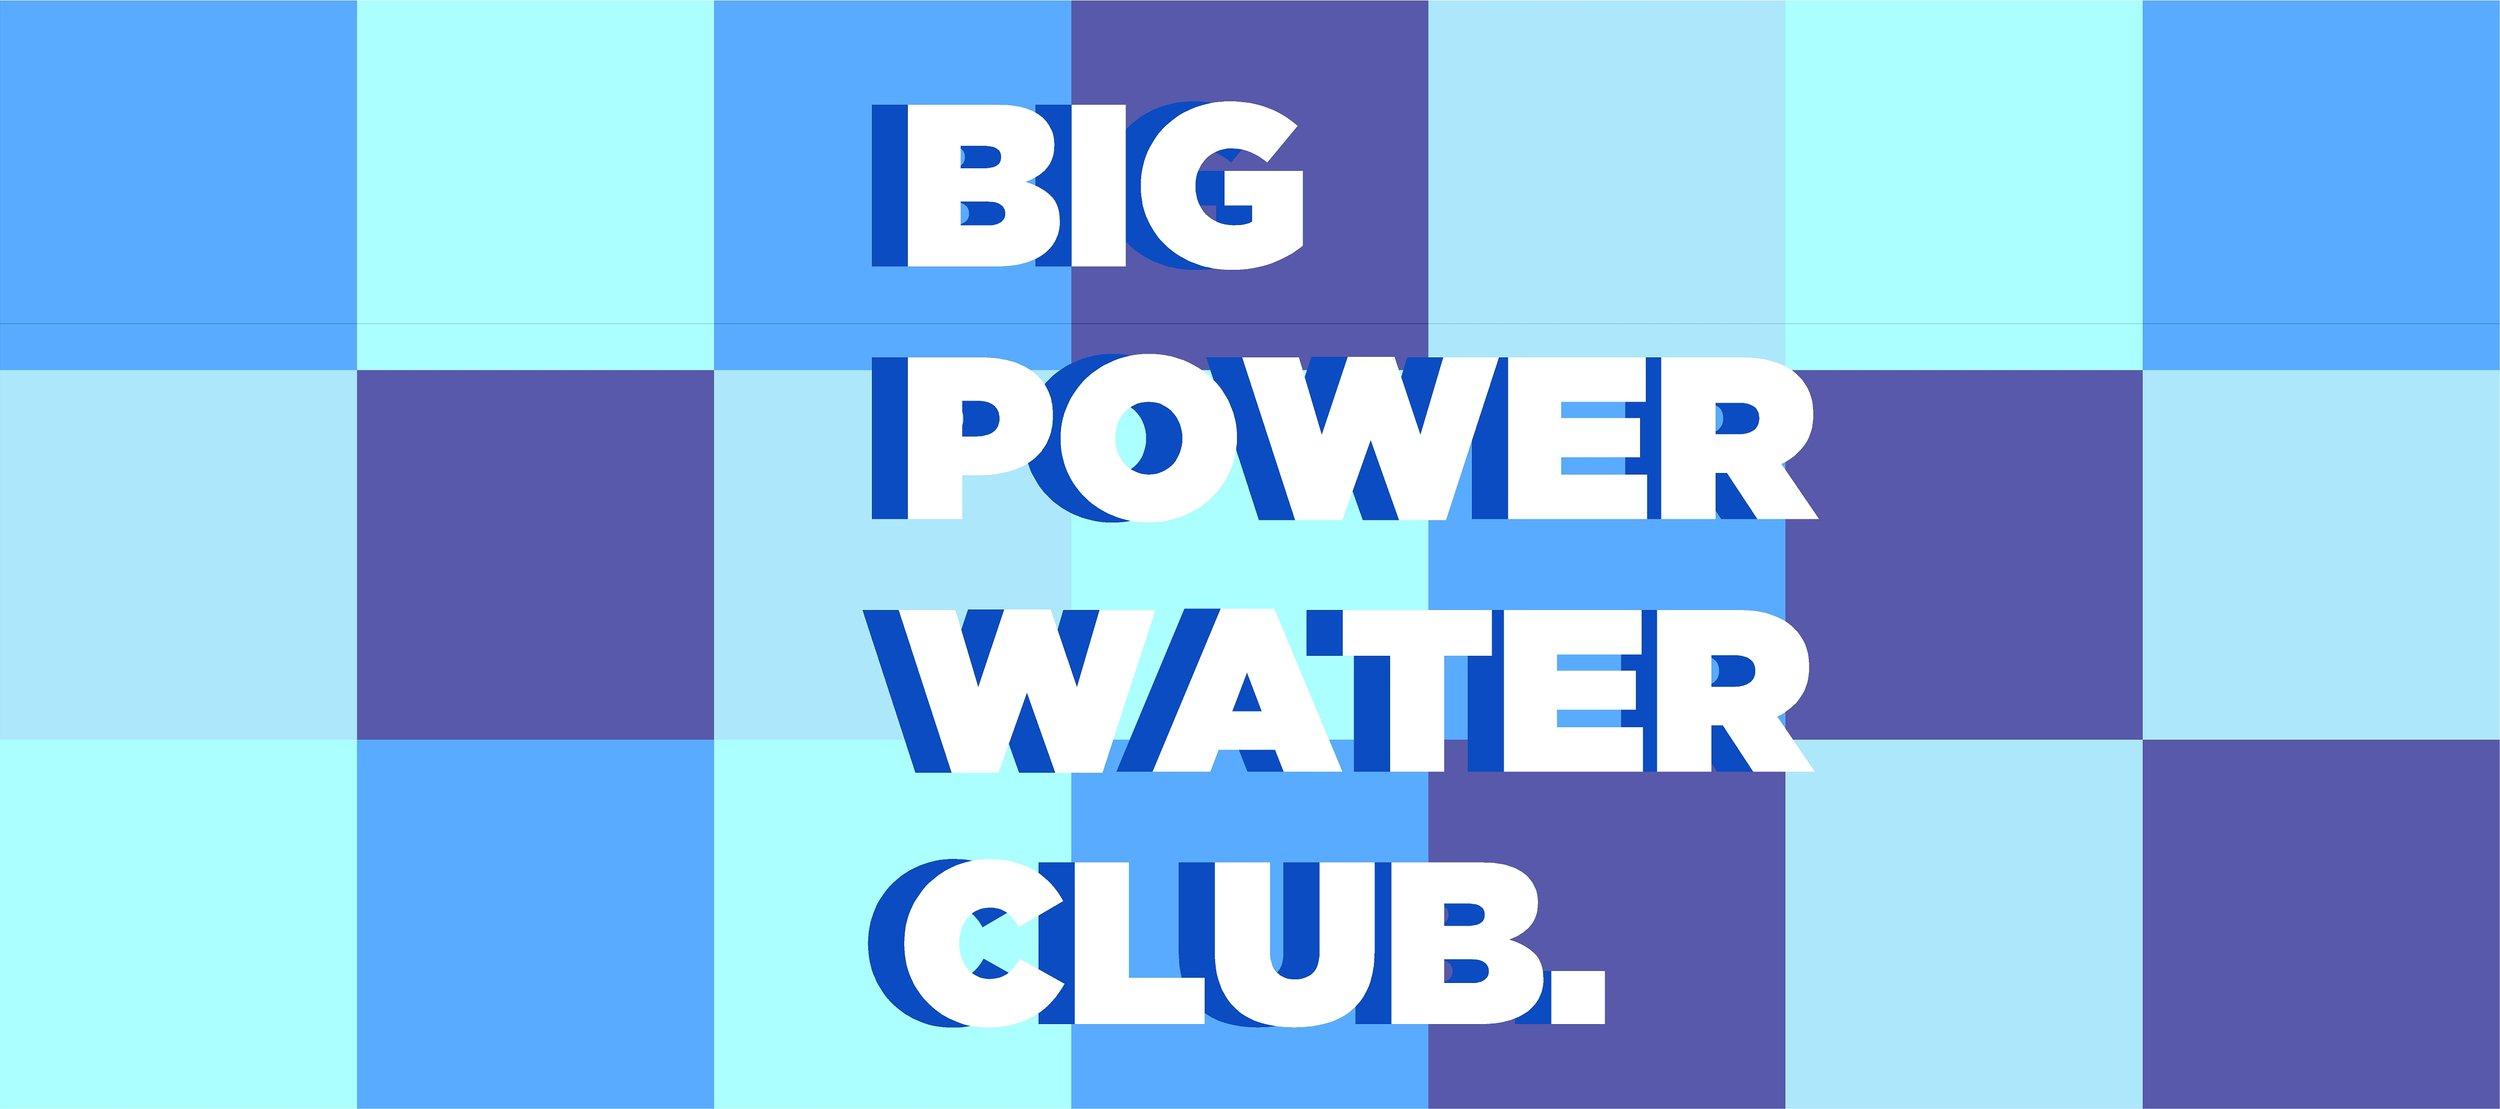 BIG POWER CLUB MAIN.jpg